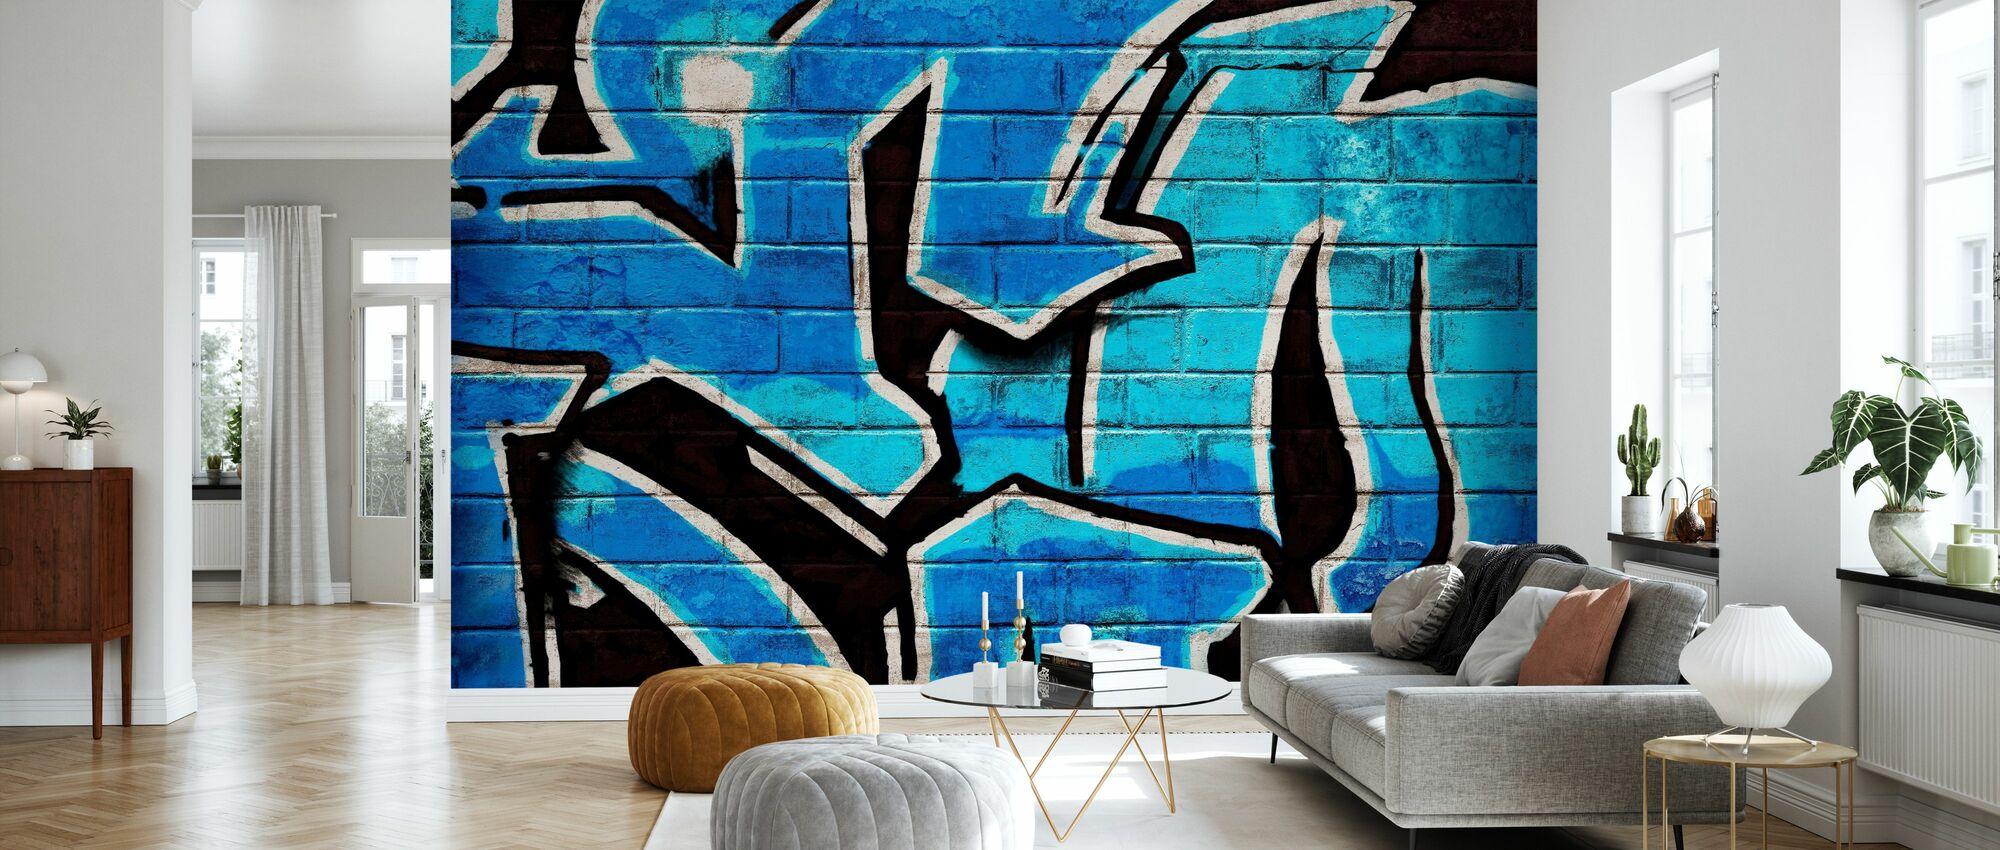 Graffiti Brick Wall - Blue - Wallpaper - Living Room